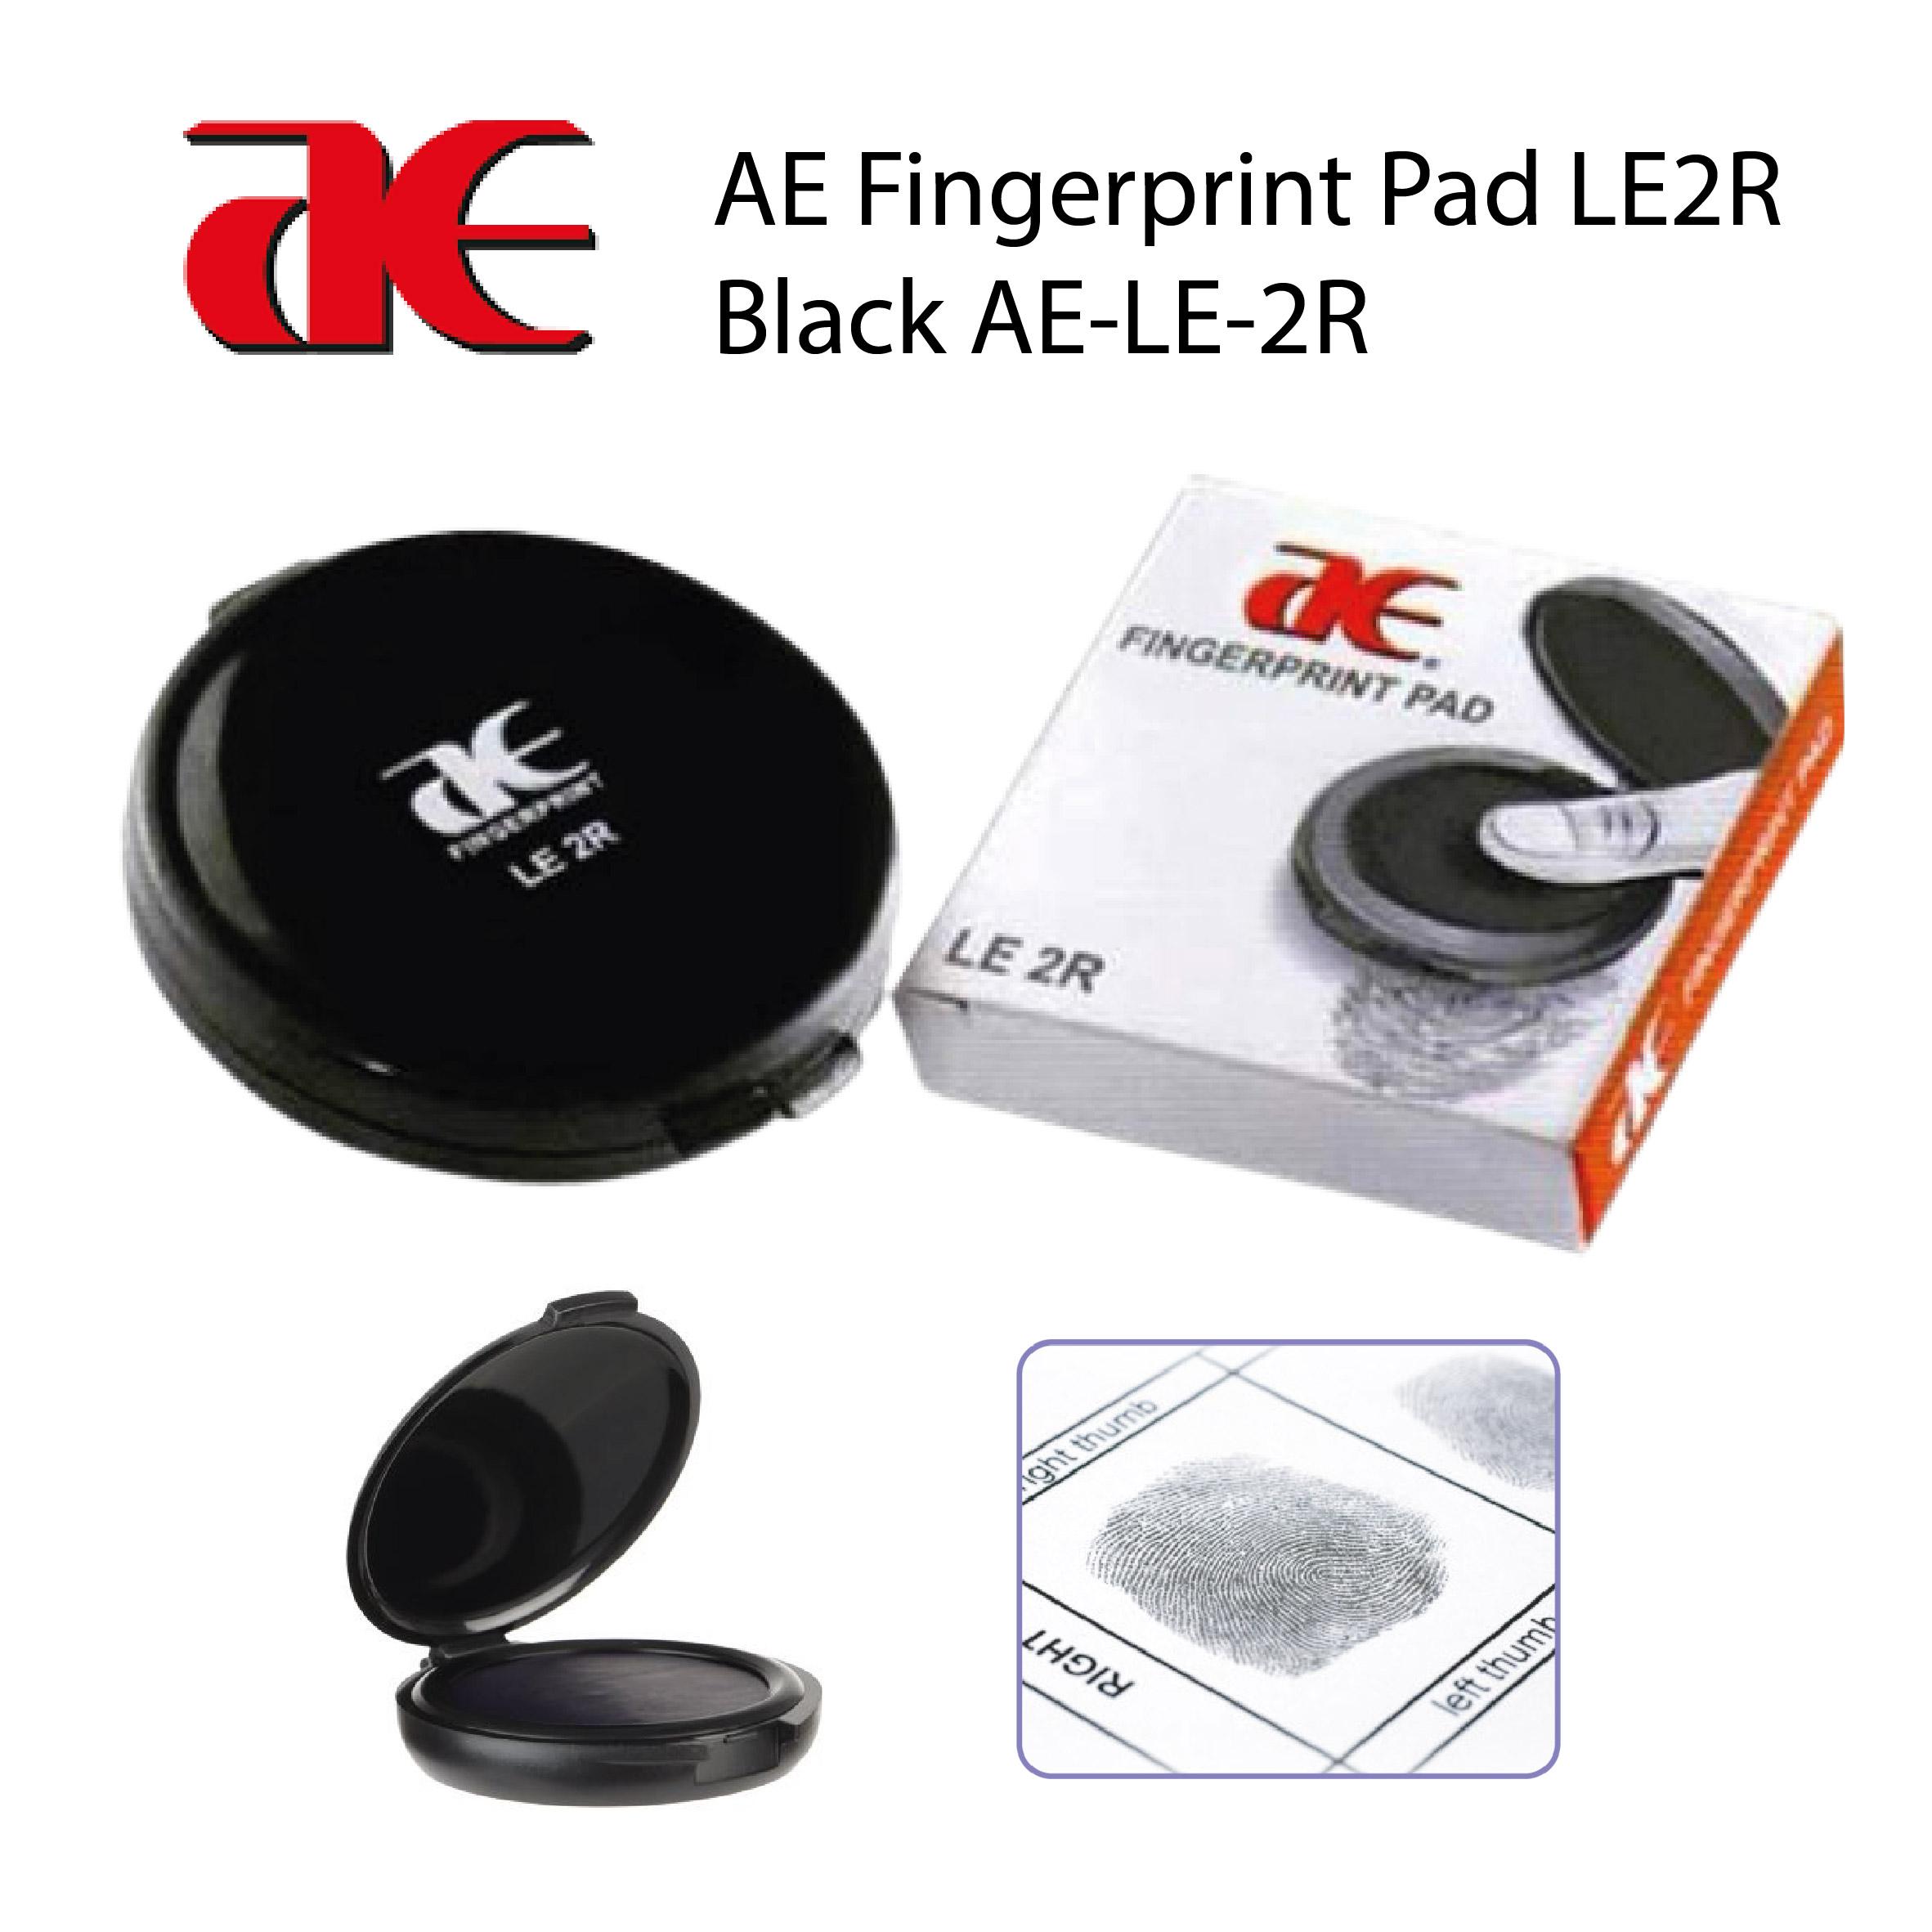 AE Fingerprint Pad LE2R Black AE-LE-2R